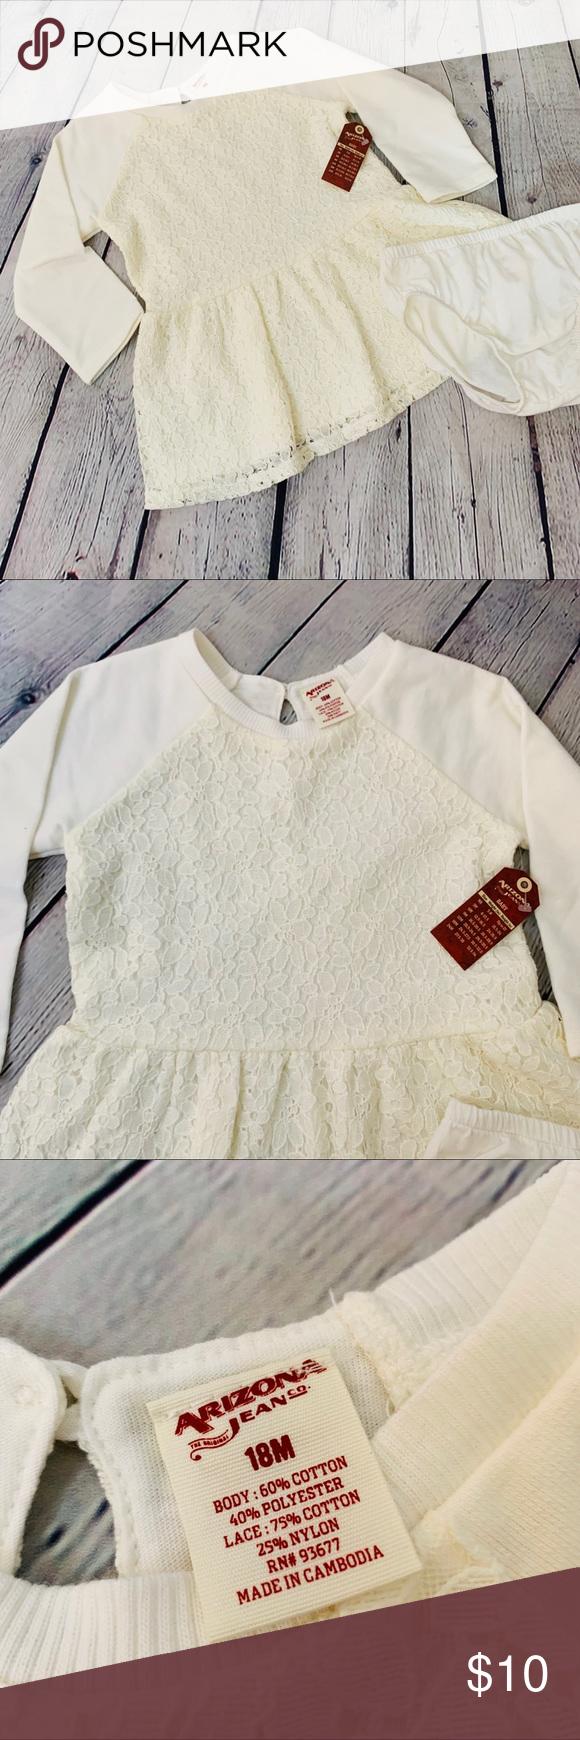 Arizona Jeans Co. NWT Cream Sweater Dress Sz18m NWT